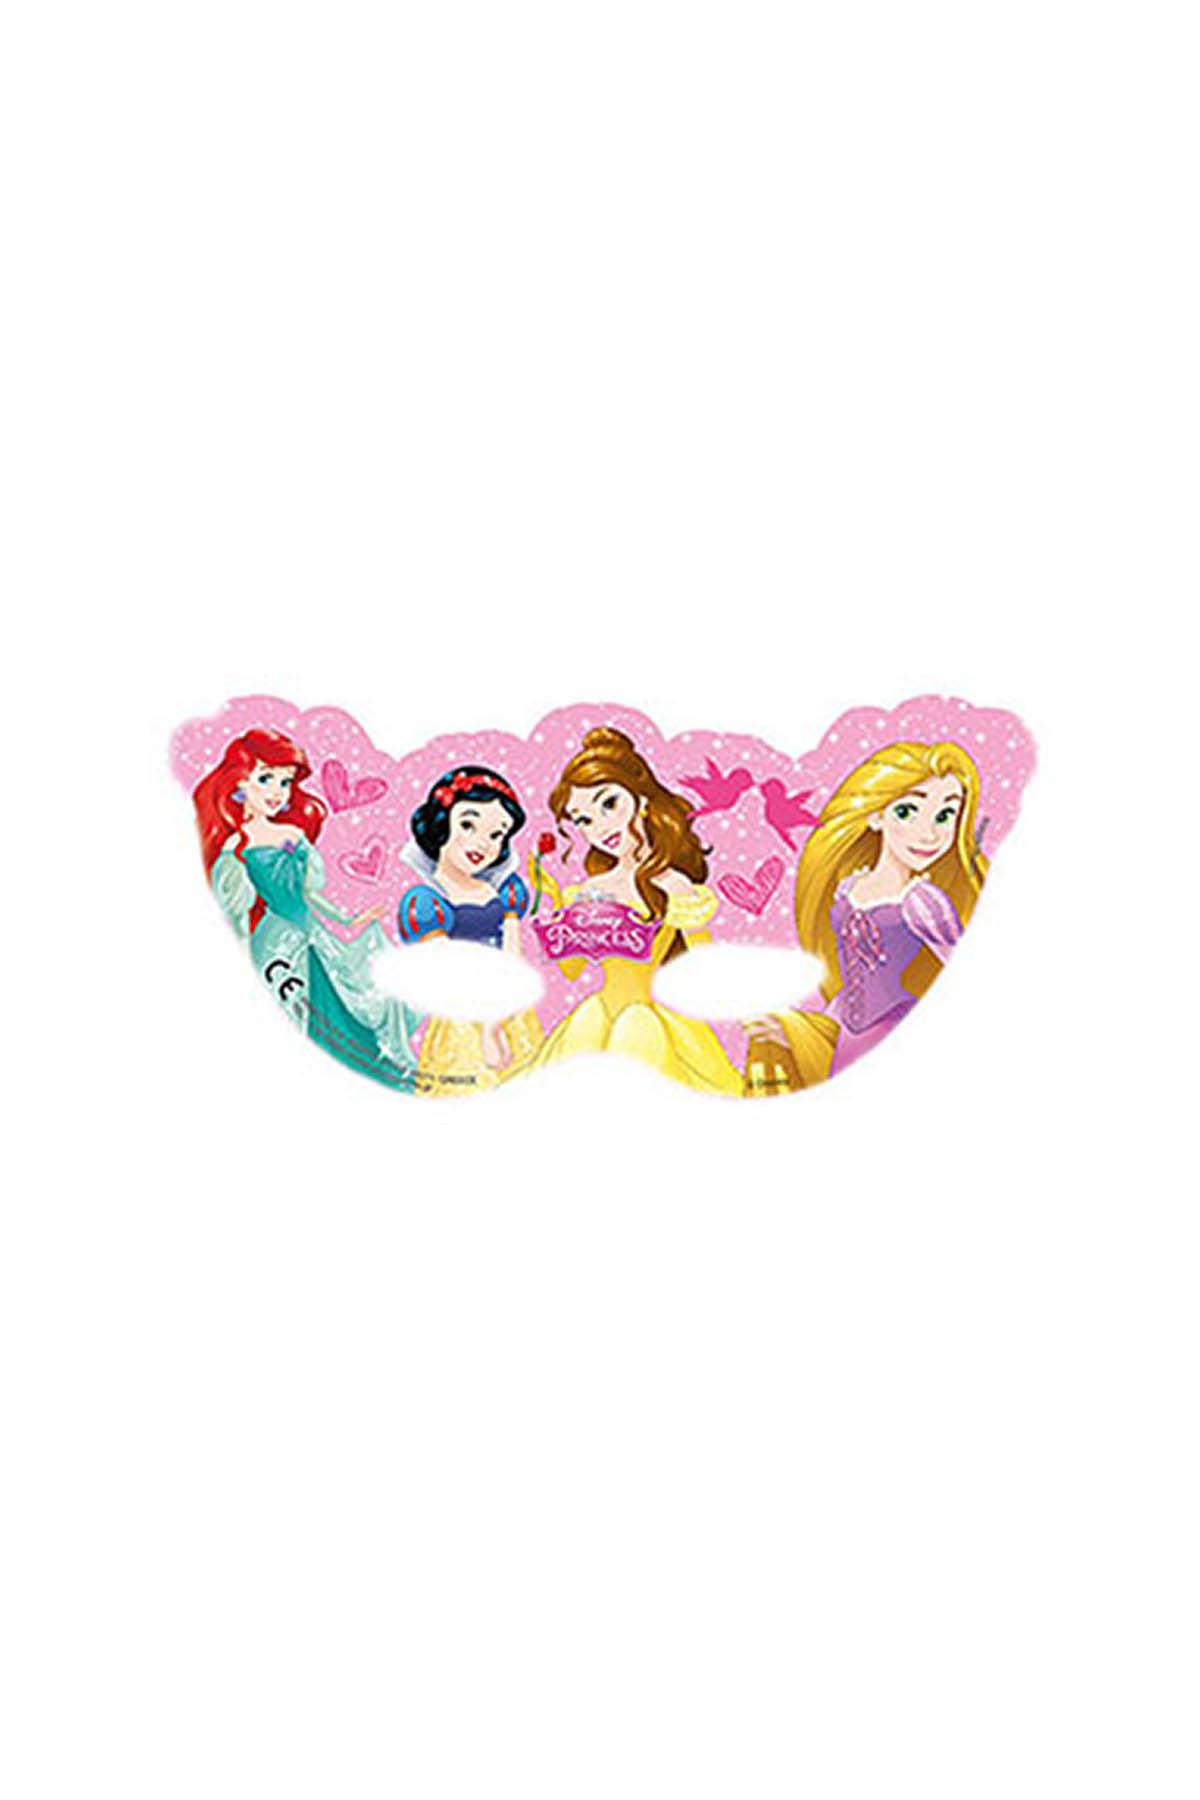 Prenses Düşler Kağıt Maske